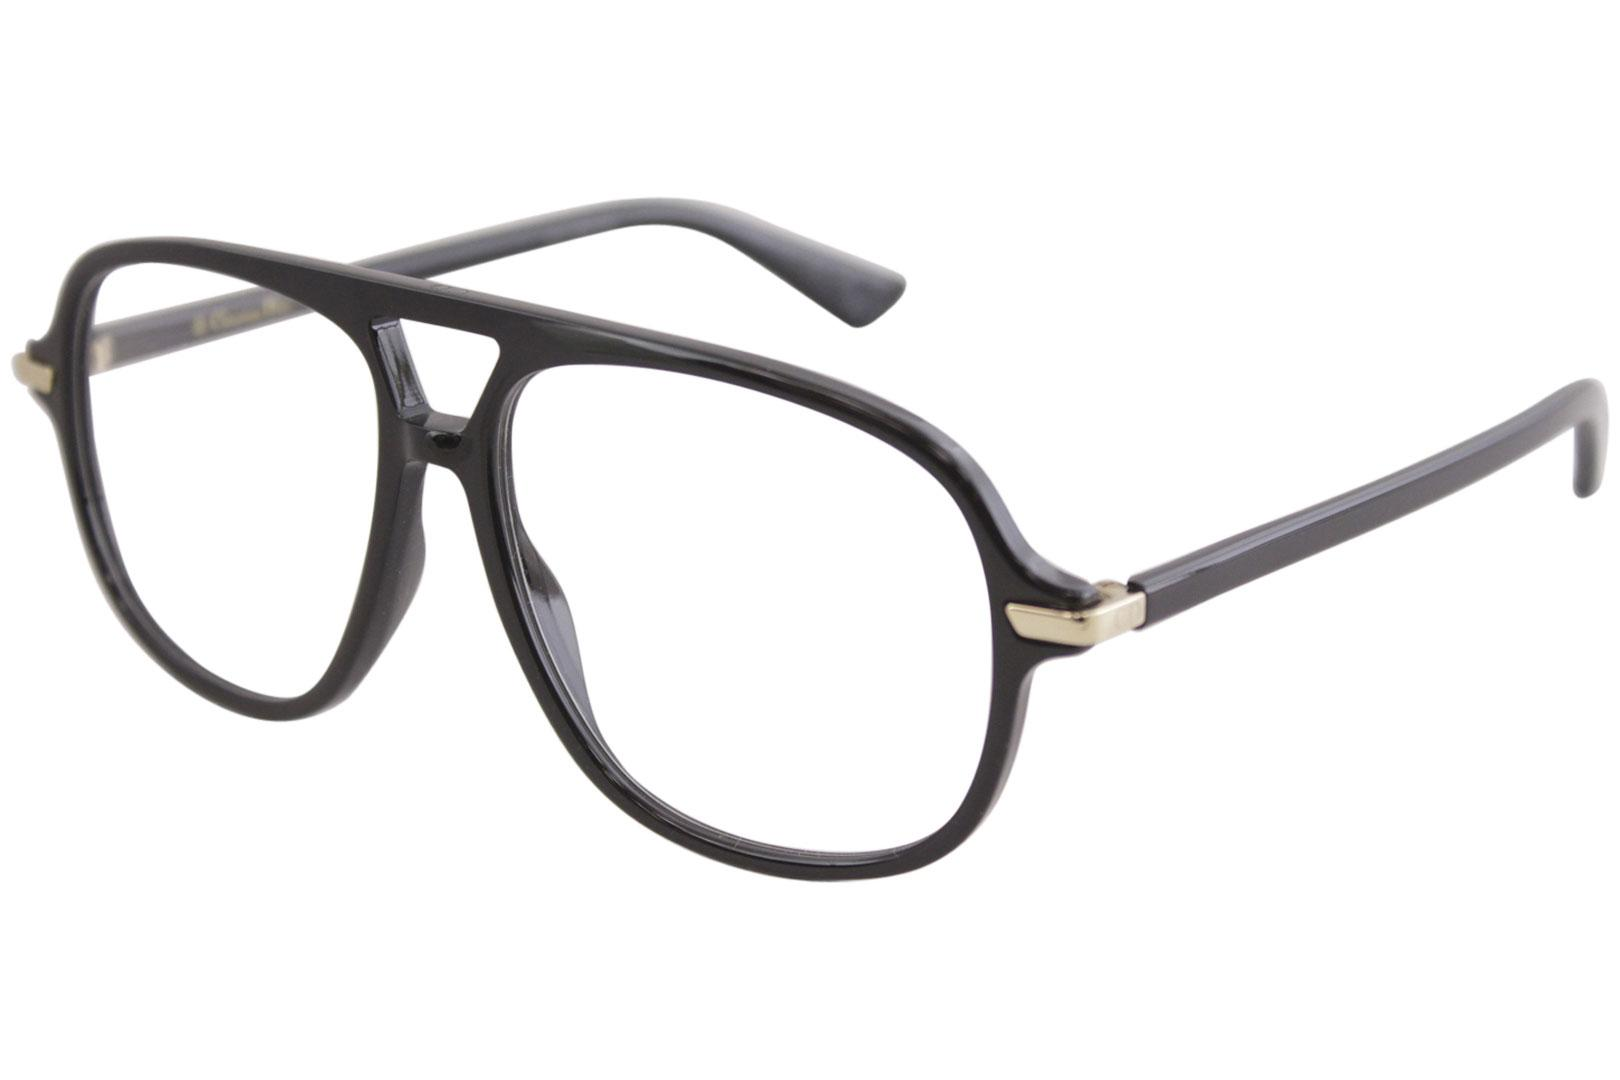 669e75edd4d7 Christian Dior Eyeglasses Women s Dioressence16 Full Rim Optical Frame